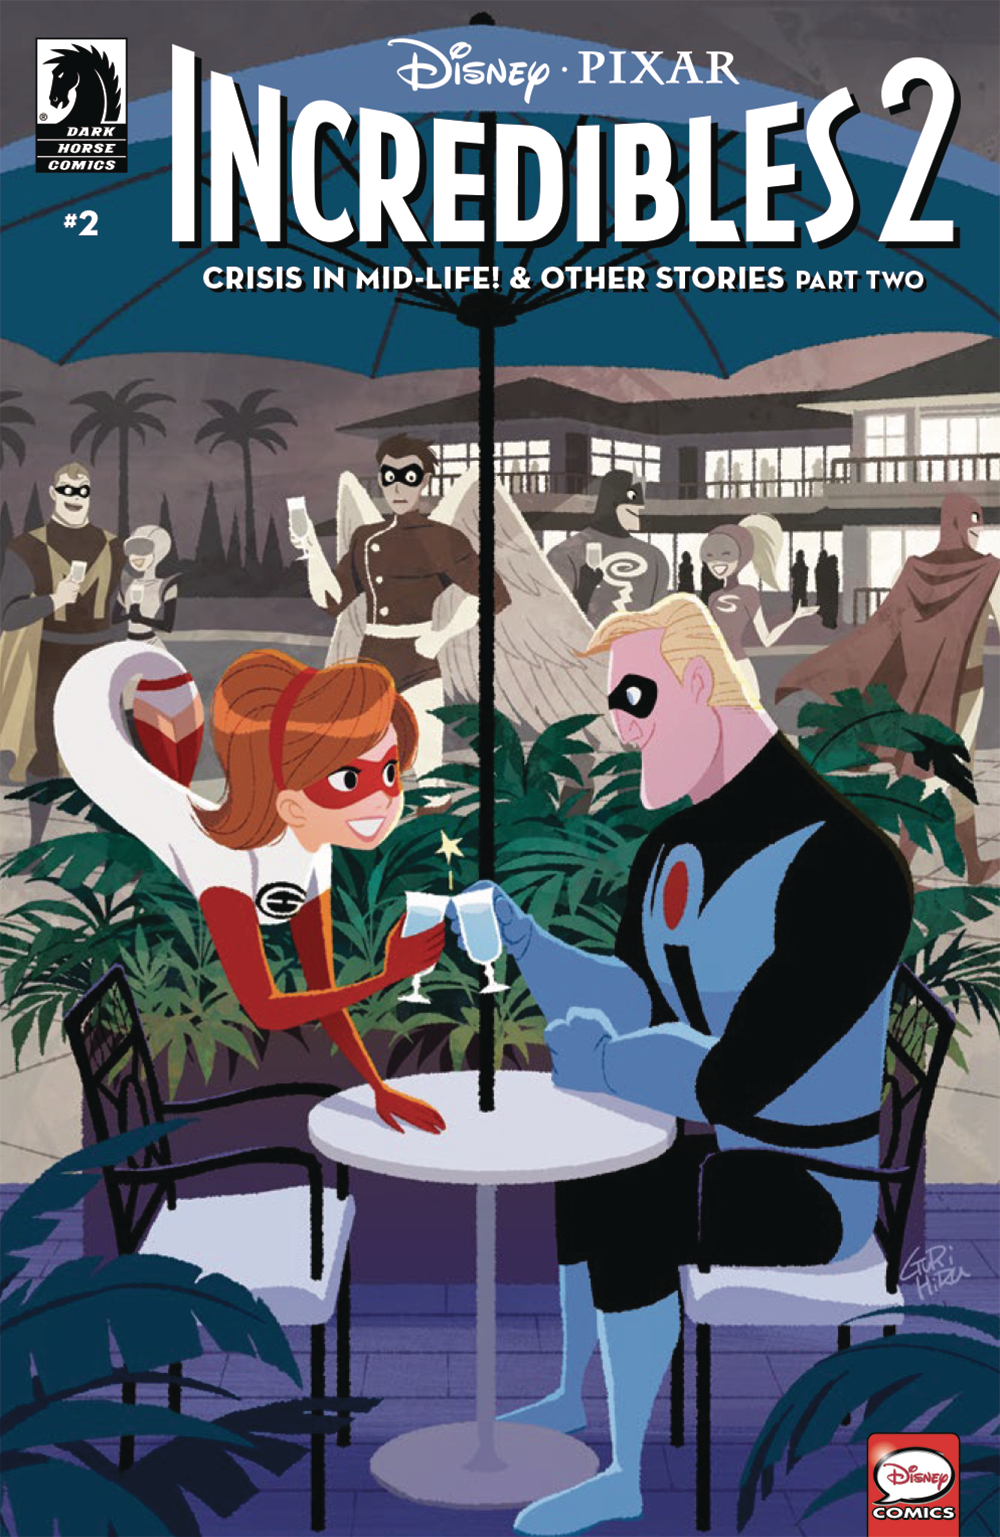 DISNEY PIXAR INCREDIBLES 2 #2 CRISIS MIDLIFE & OTHER STORIES